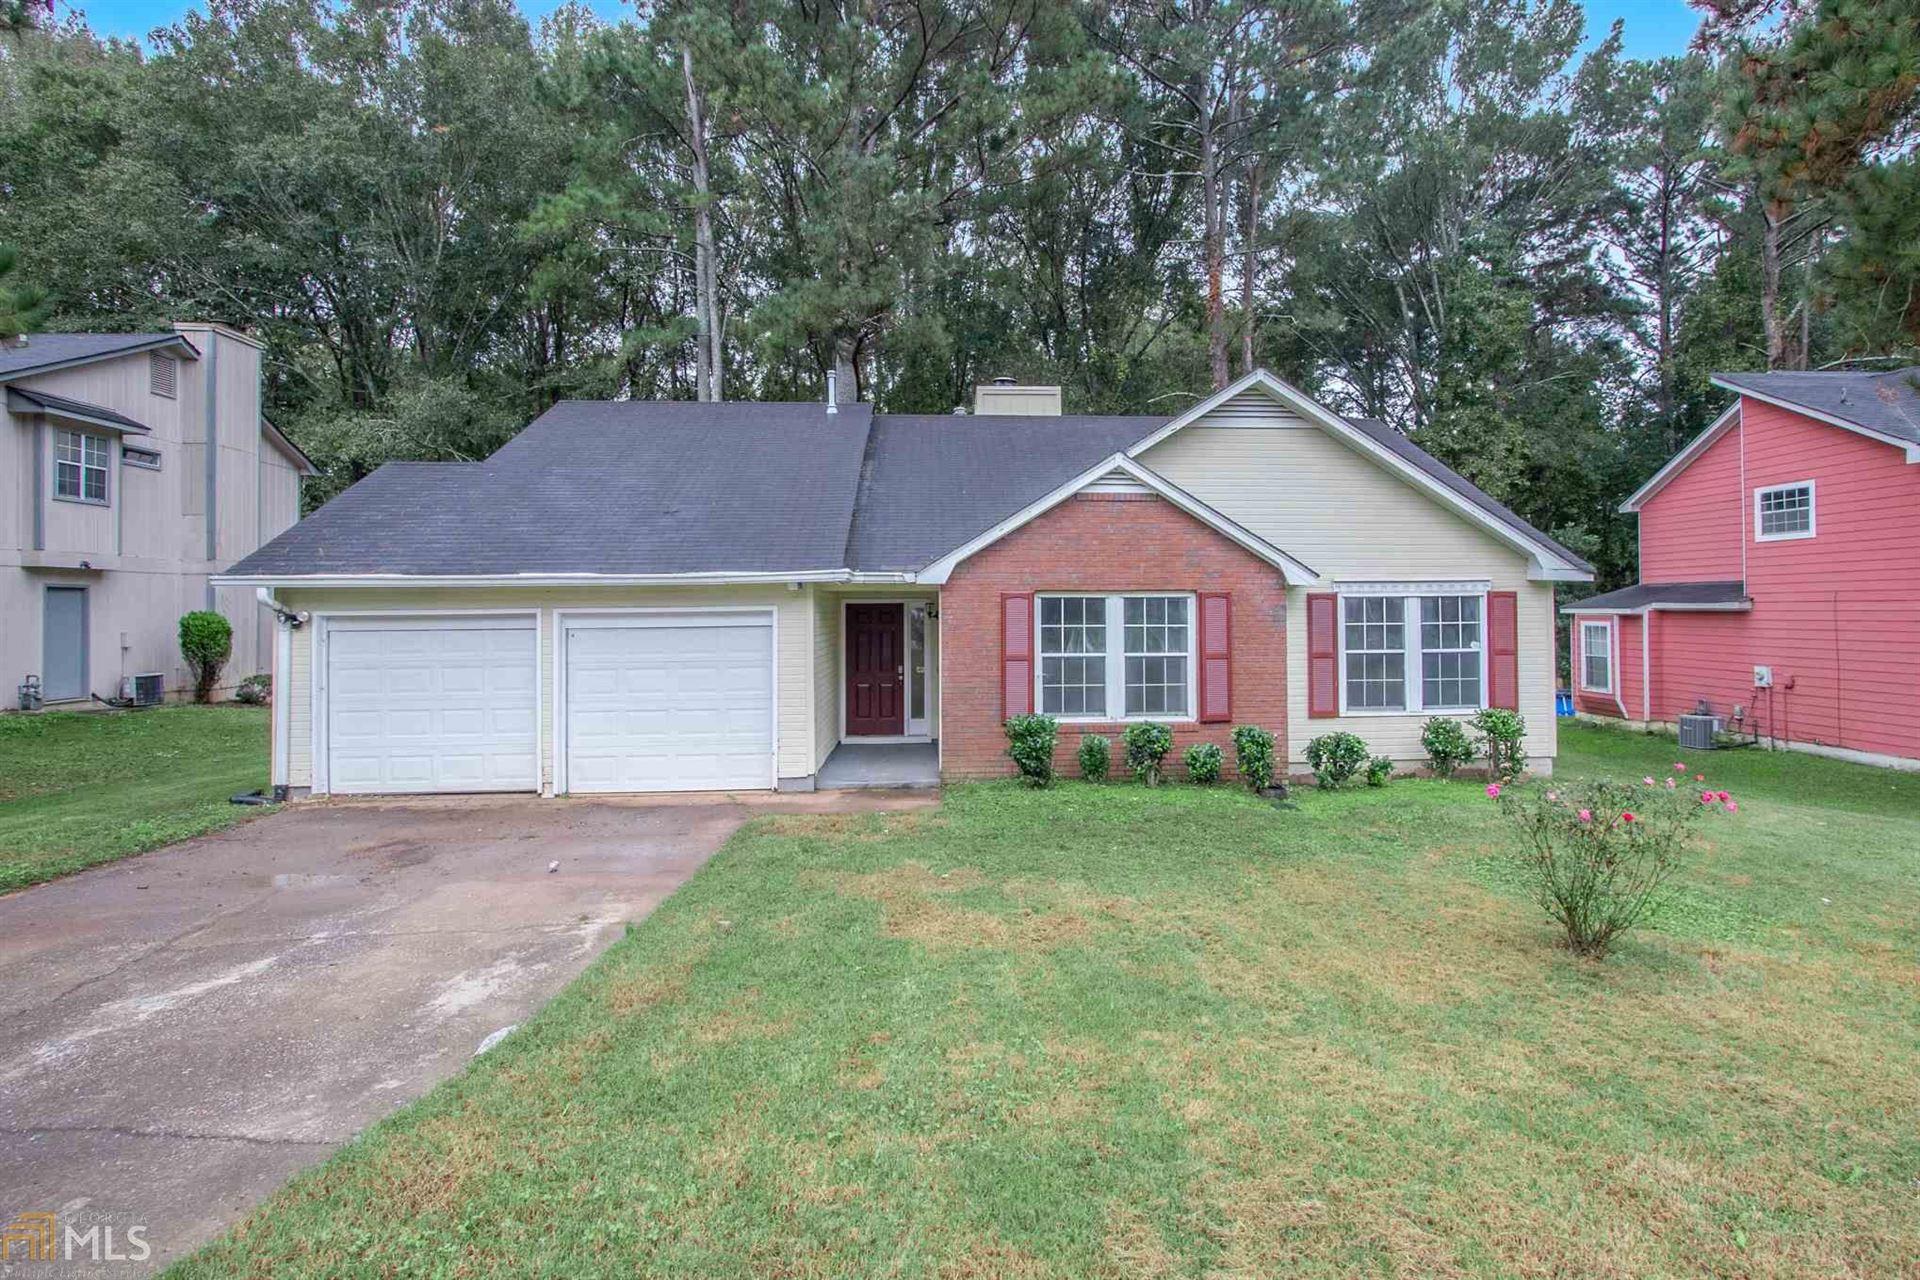 200 Blue Heron, Jonesboro, GA 30238 - MLS#: 8879717